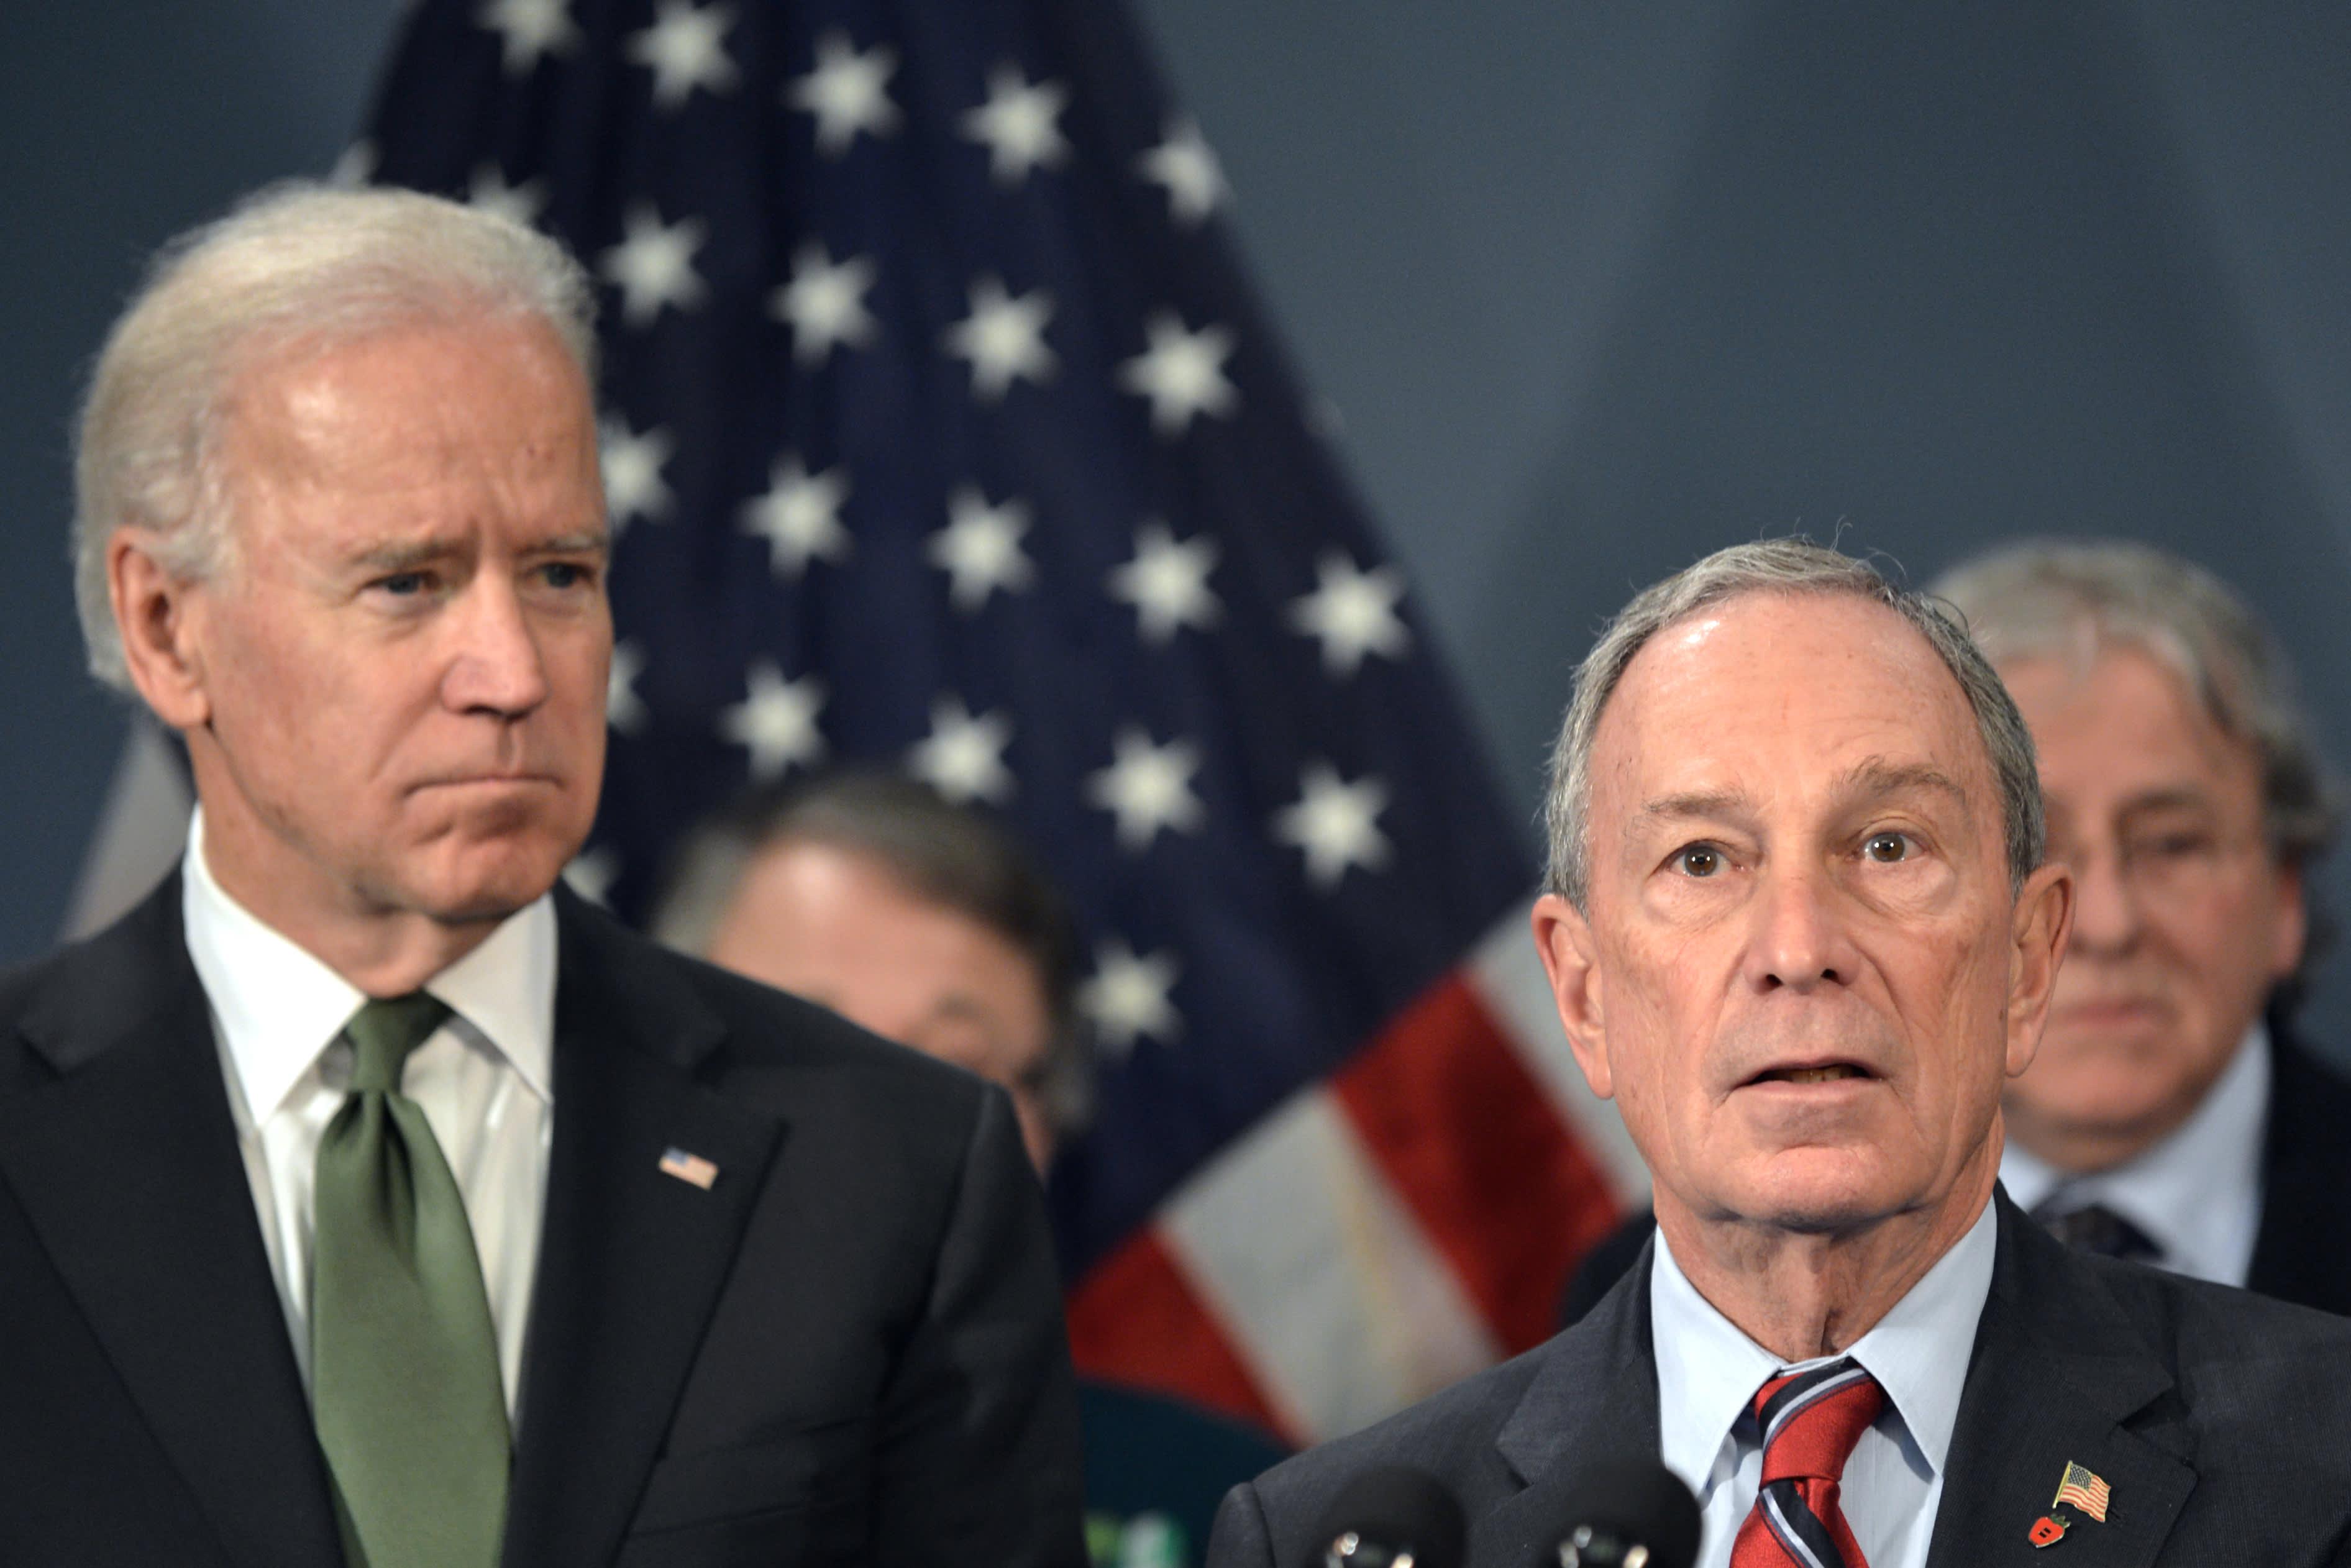 Biden and Bloomberg are bigger threats to Big Pharma than Warren, analyst says